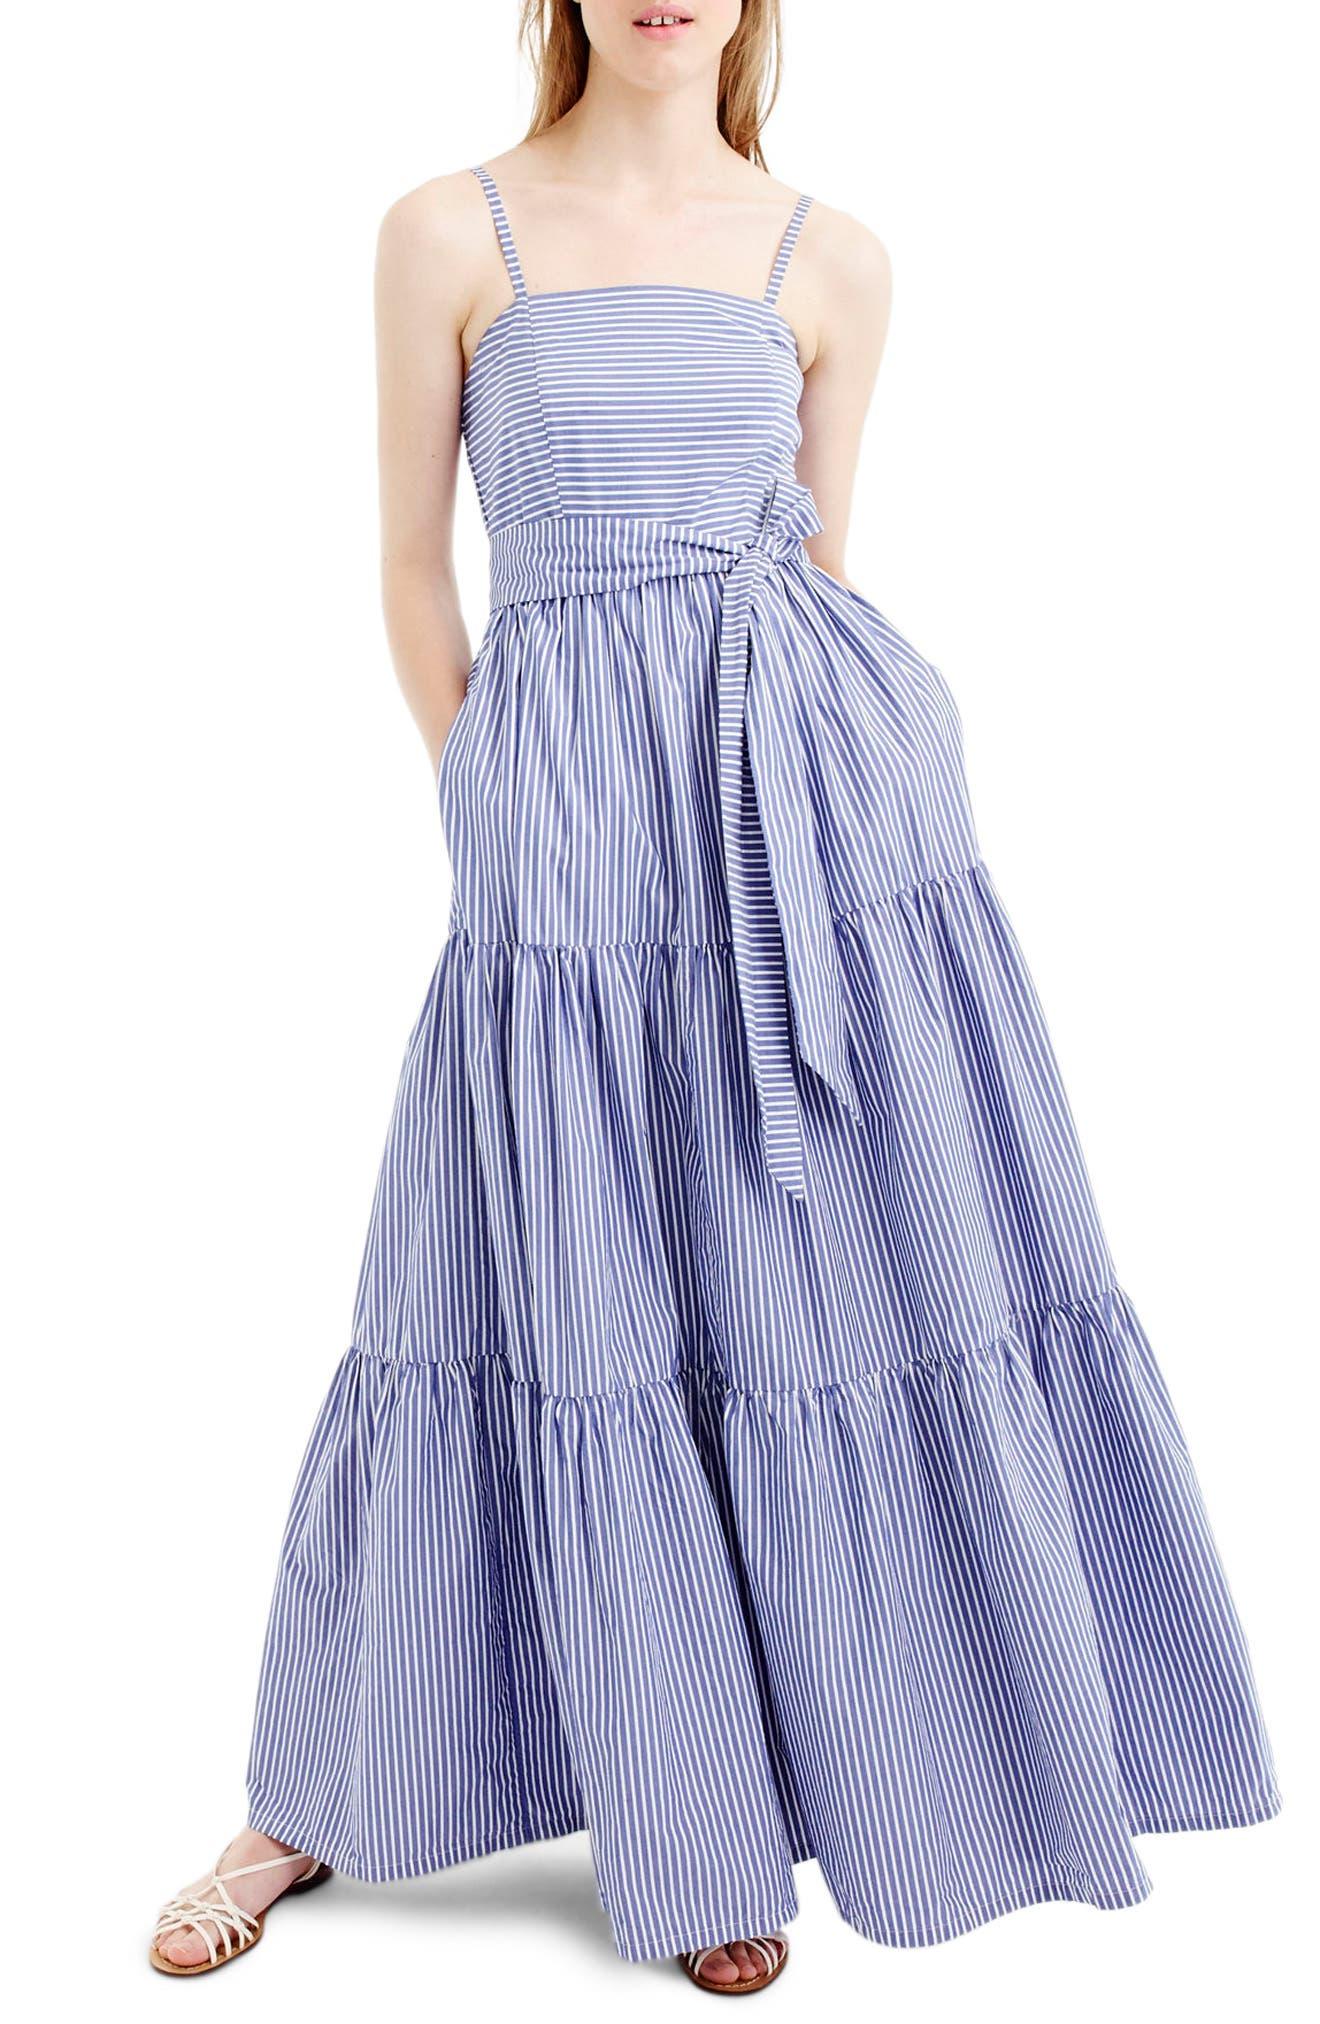 Alternate Image 1 Selected - J.Crew Stripe Tiered Maxi Dress (Regular & Petite)